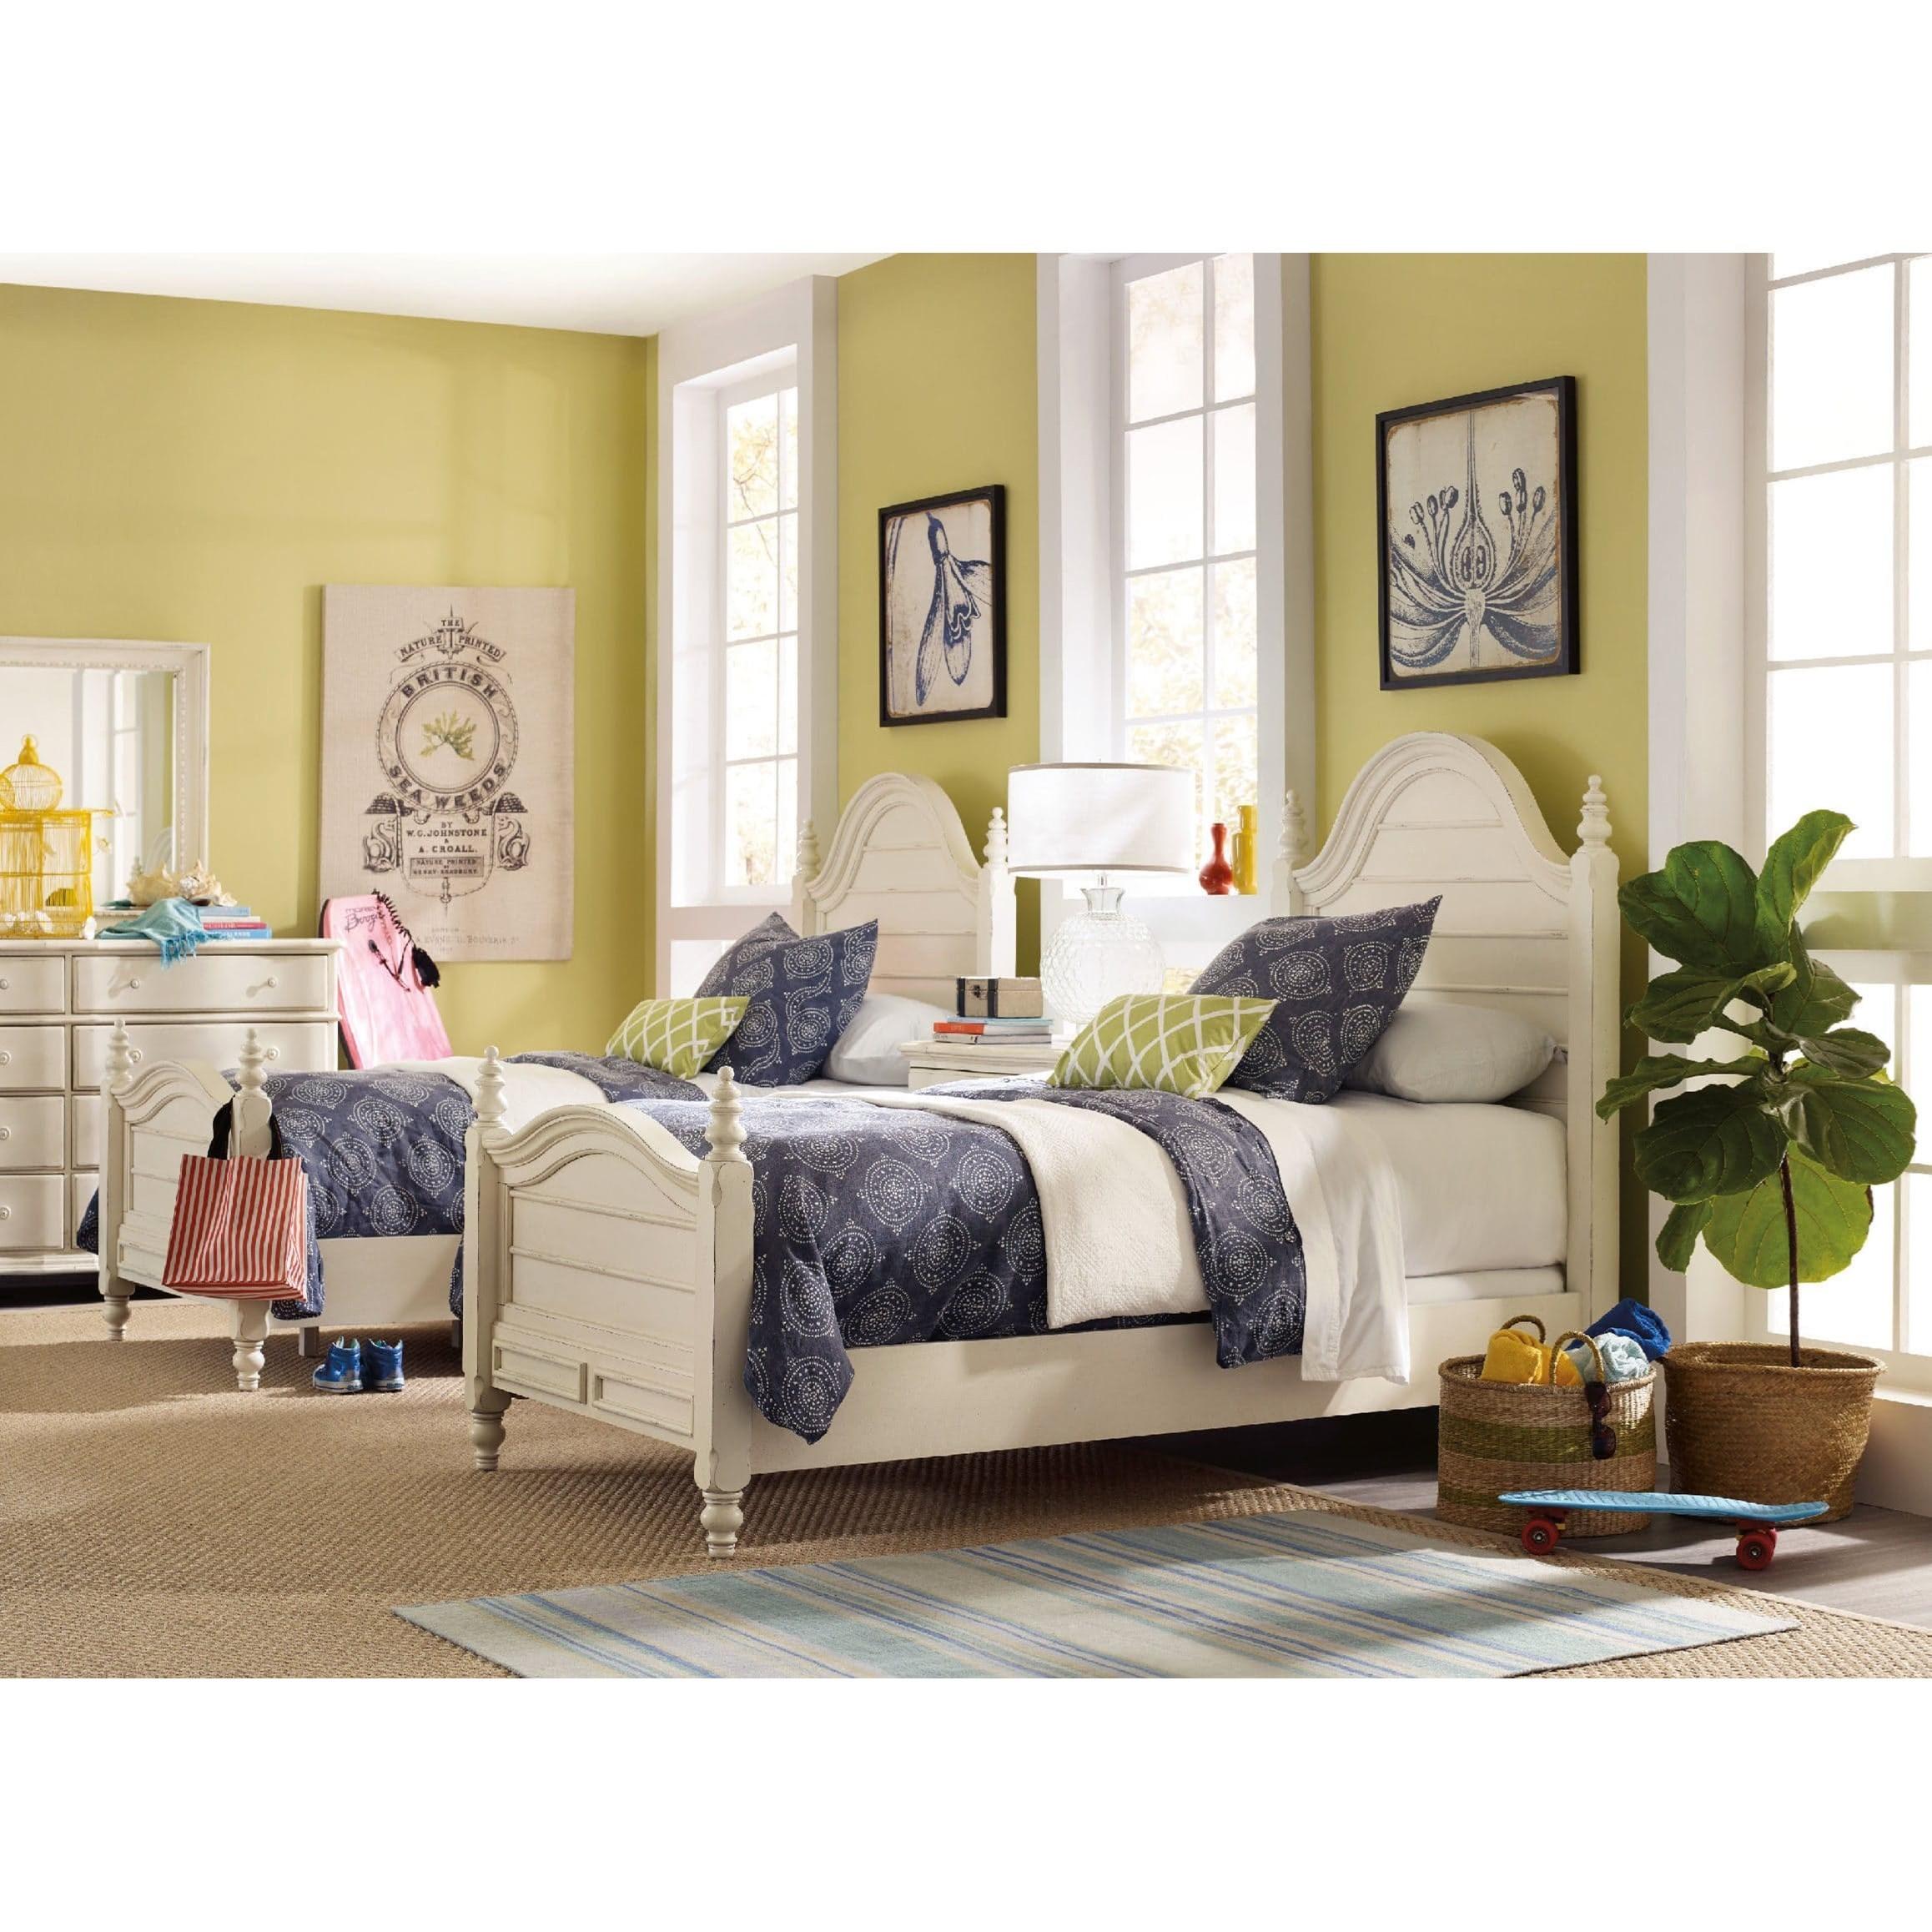 Hooker furniture sandcastle twin bedroom group for Bedroom groups